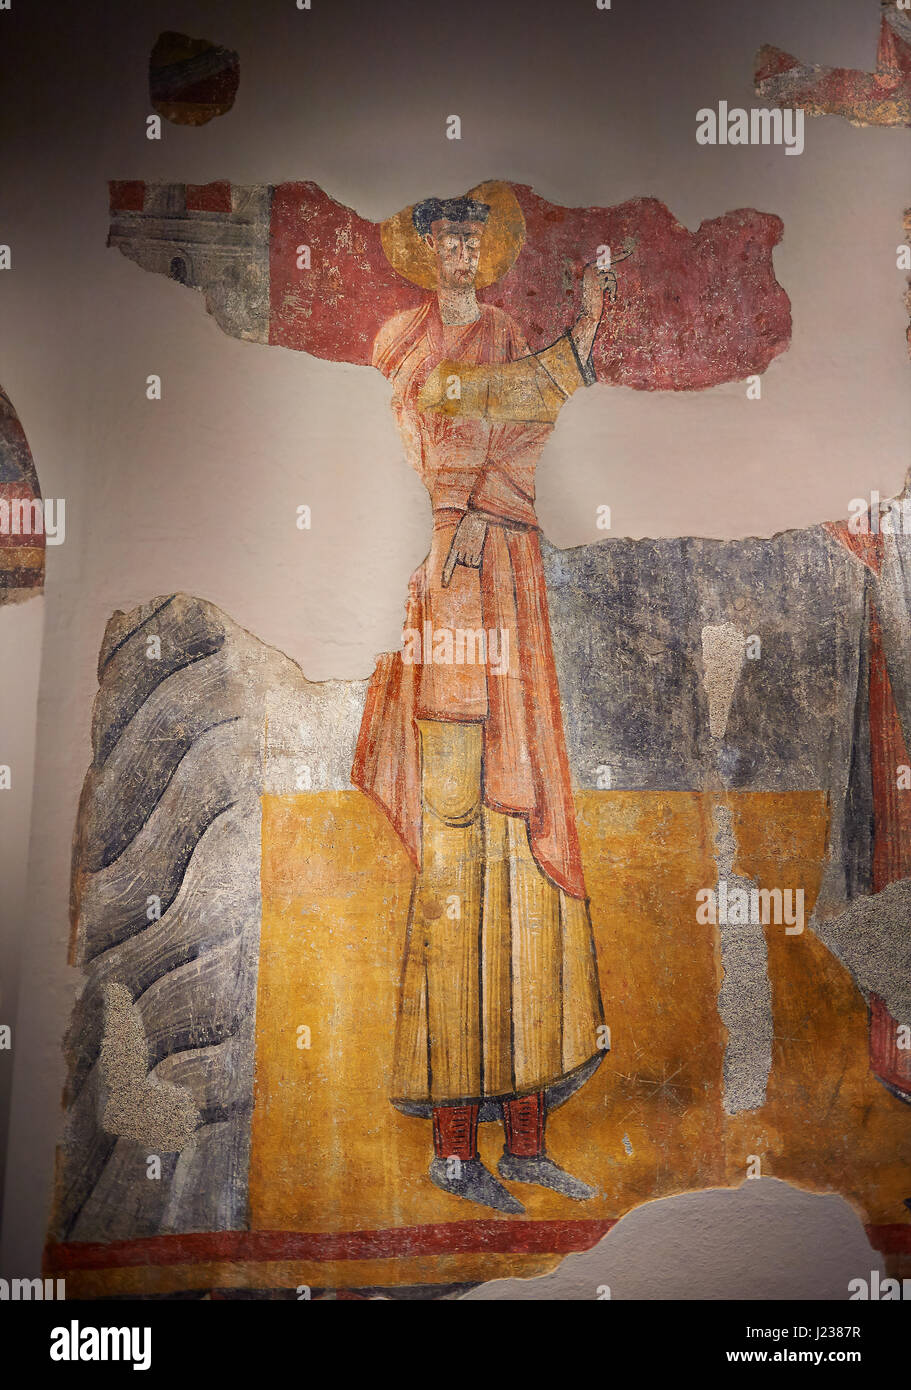 Fresco Transfer to canvas From the Church of Saint Joan Boi, Val de Boi, High Ribagorca, Pyranese, Spain. MNAC - Stock Image